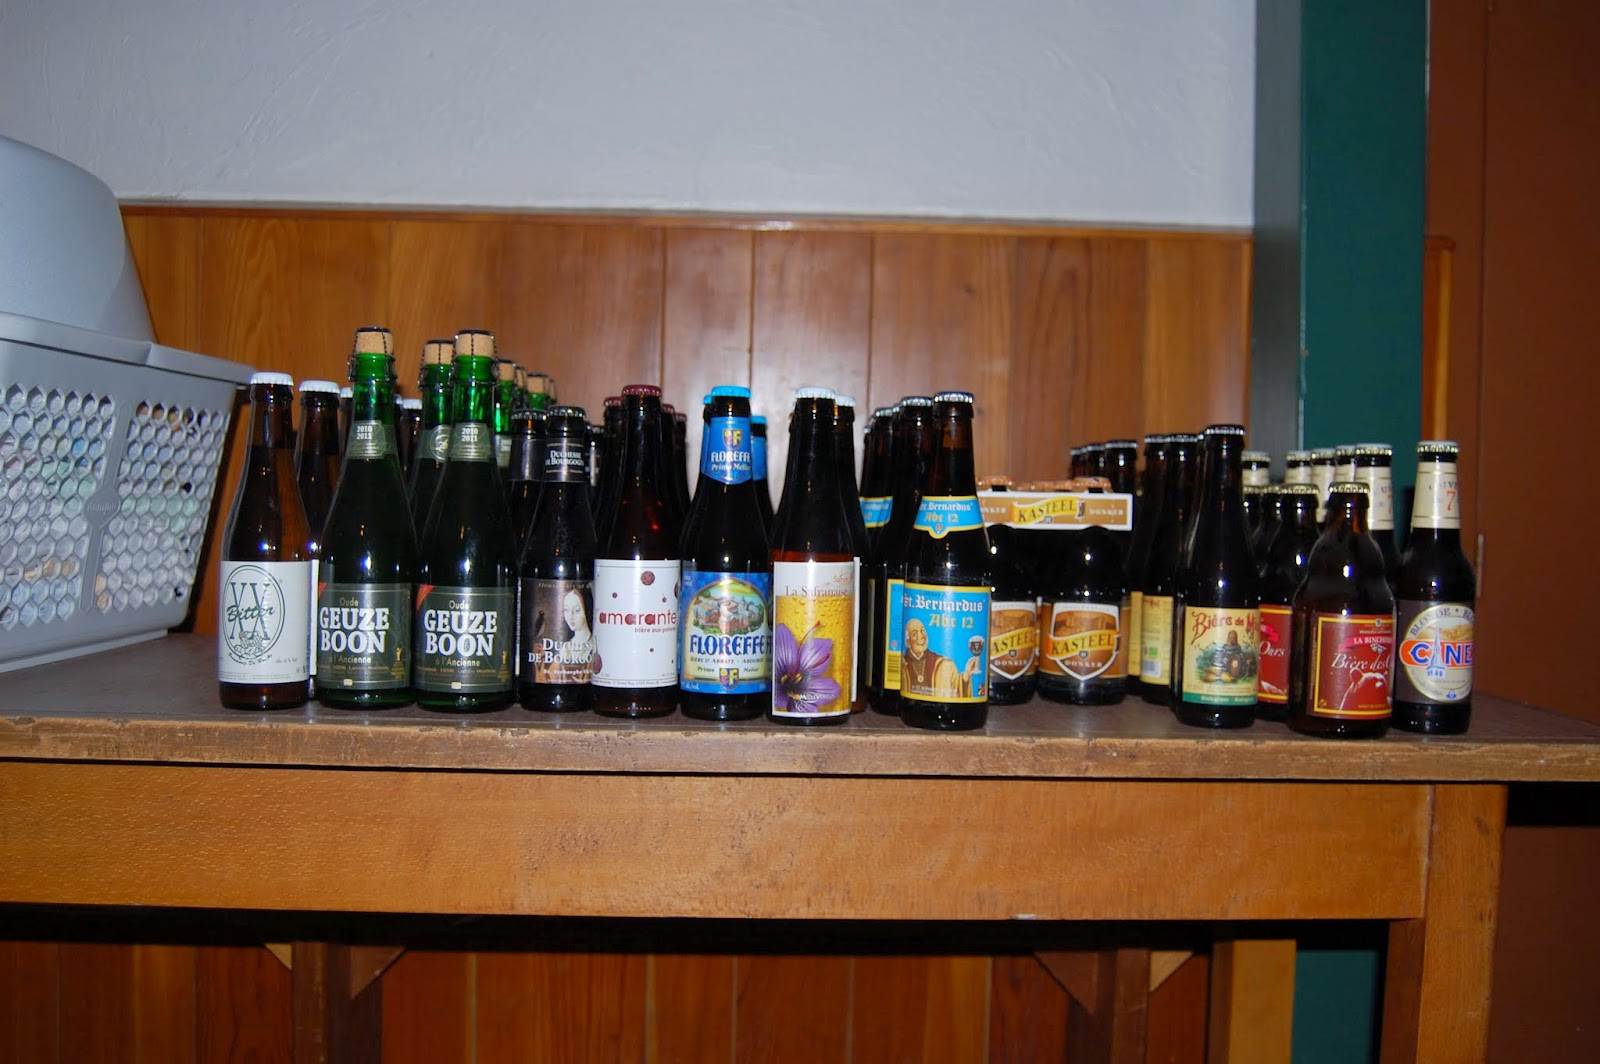 Bierverkostung Dezember 2013